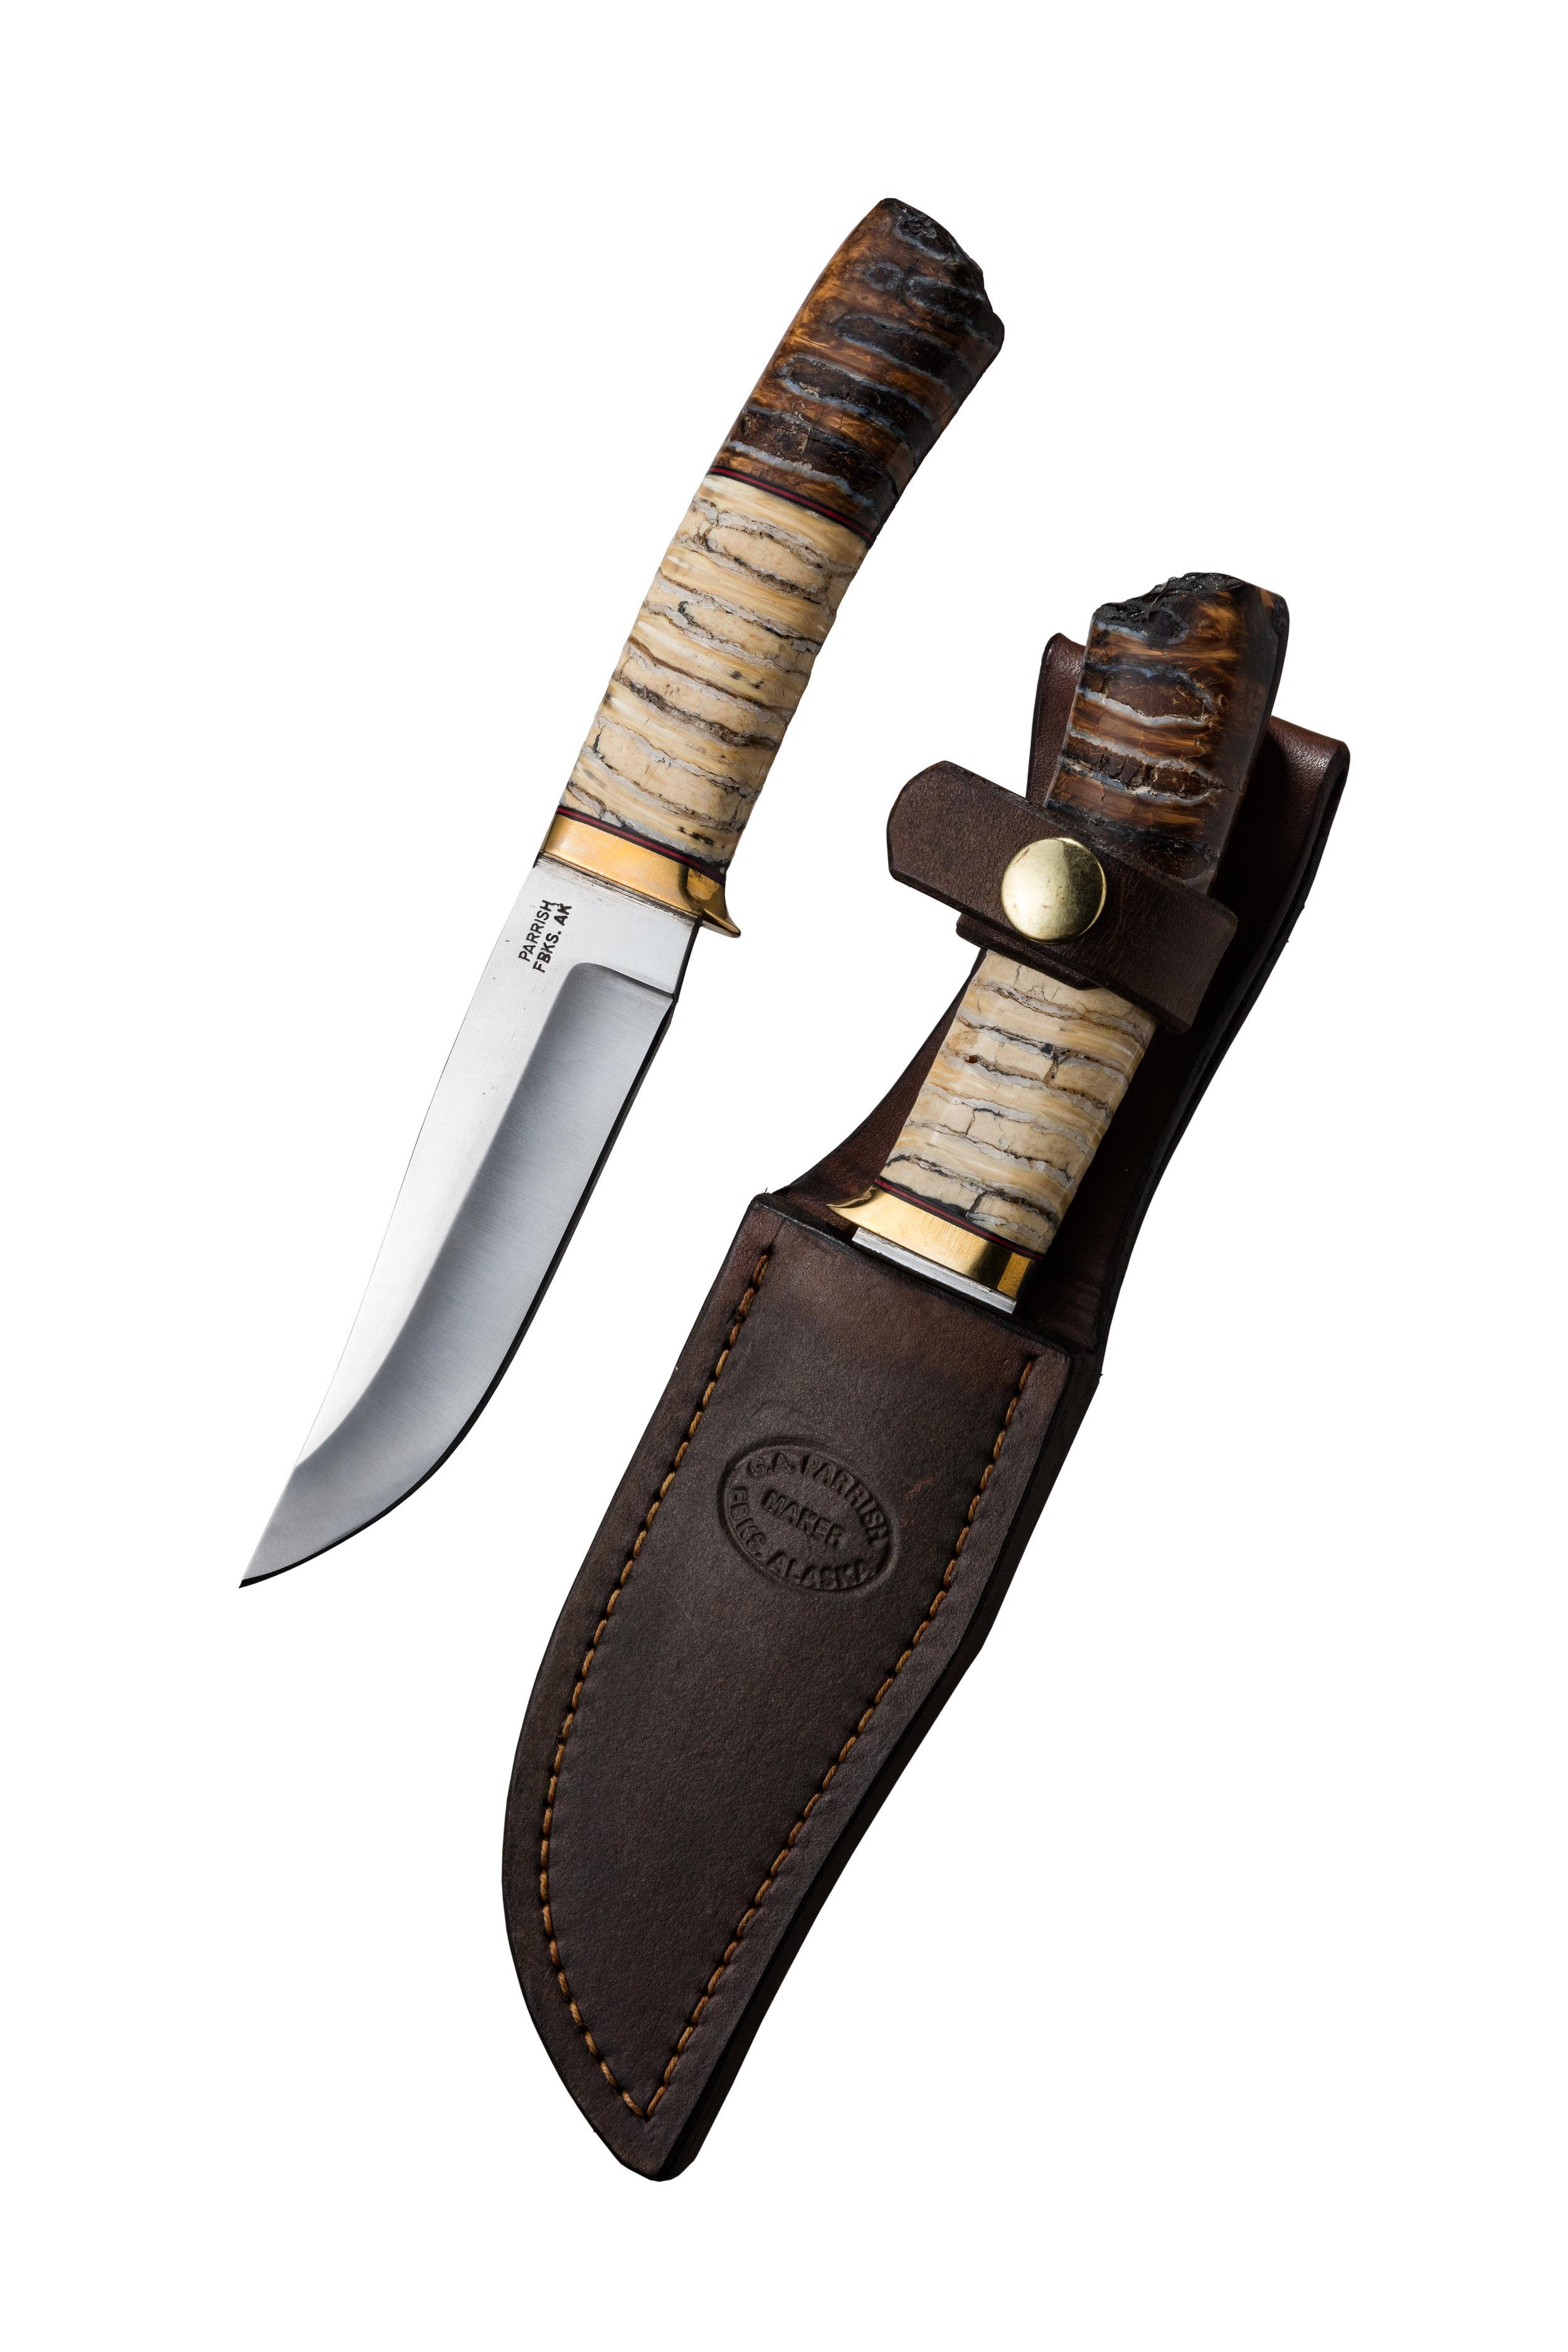 (002 of 006) - Knives (2 of 6).jpg